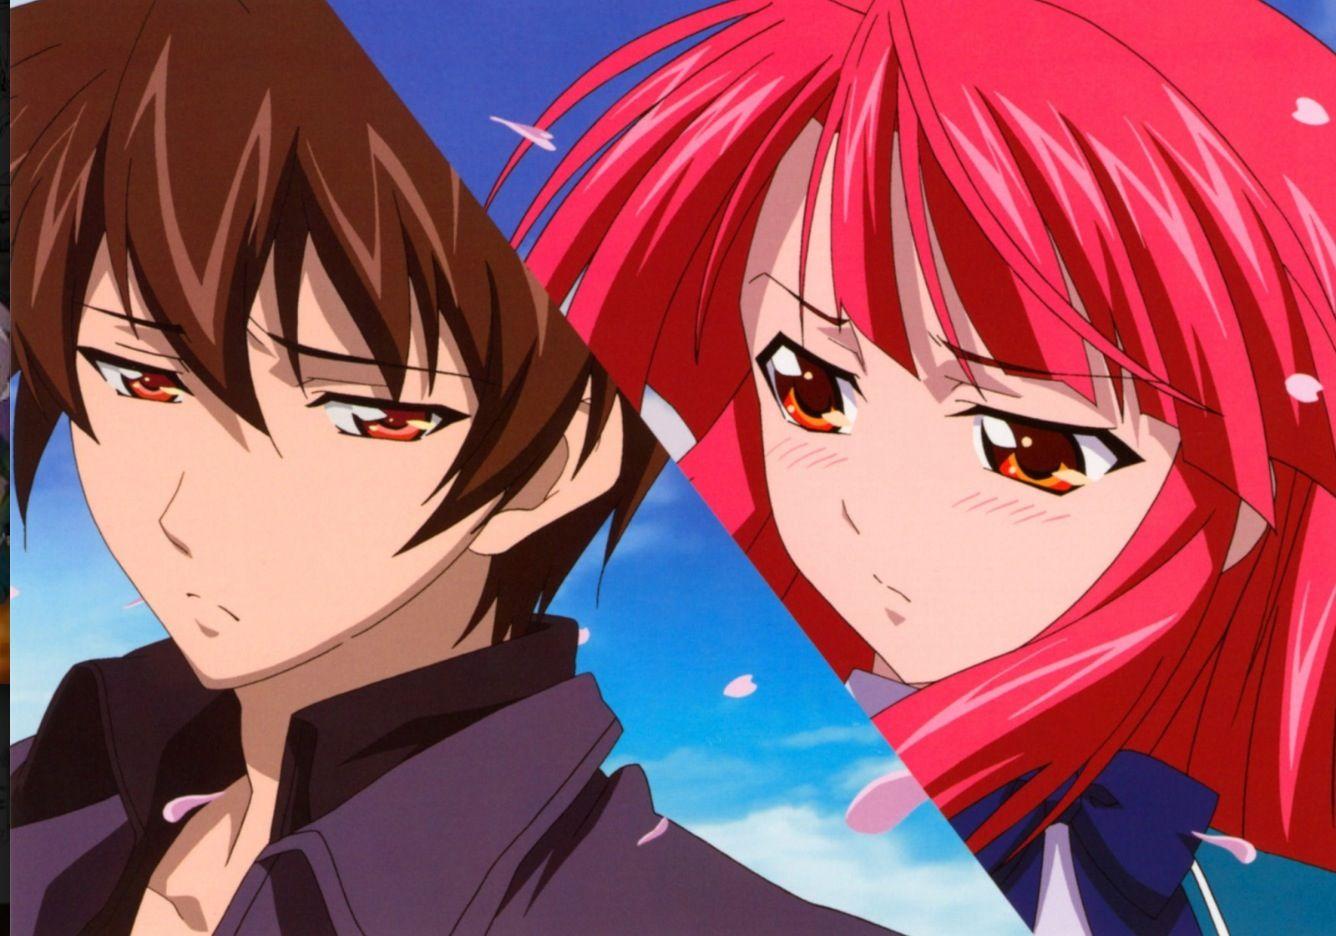 Kaze no stigma Ayano and Kazuma sad feelings - true nature